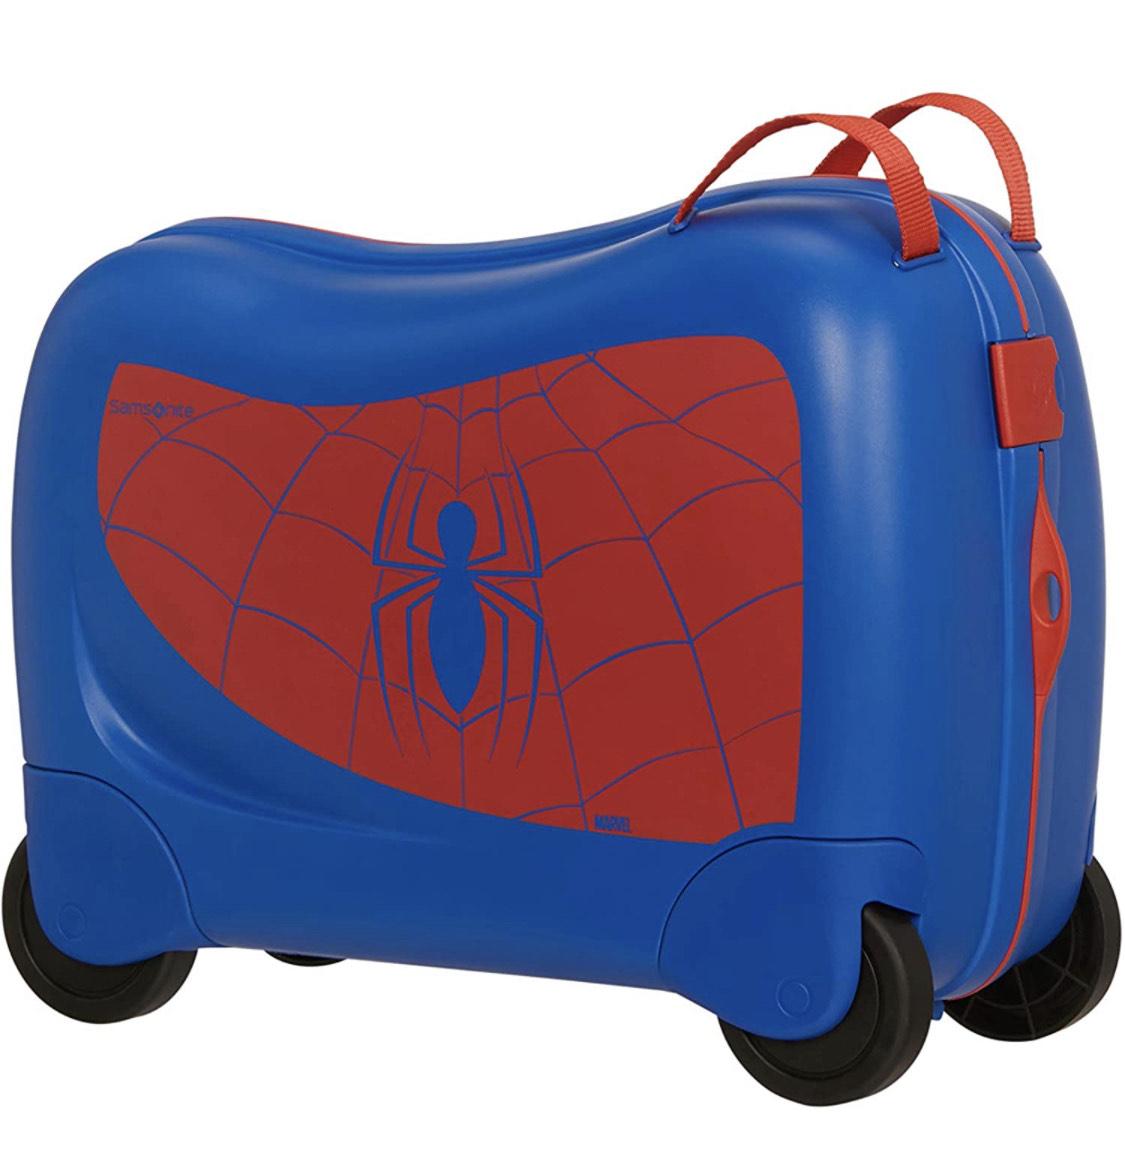 Maleta Rider Sansonite Spiderman 51 cm, 28 L